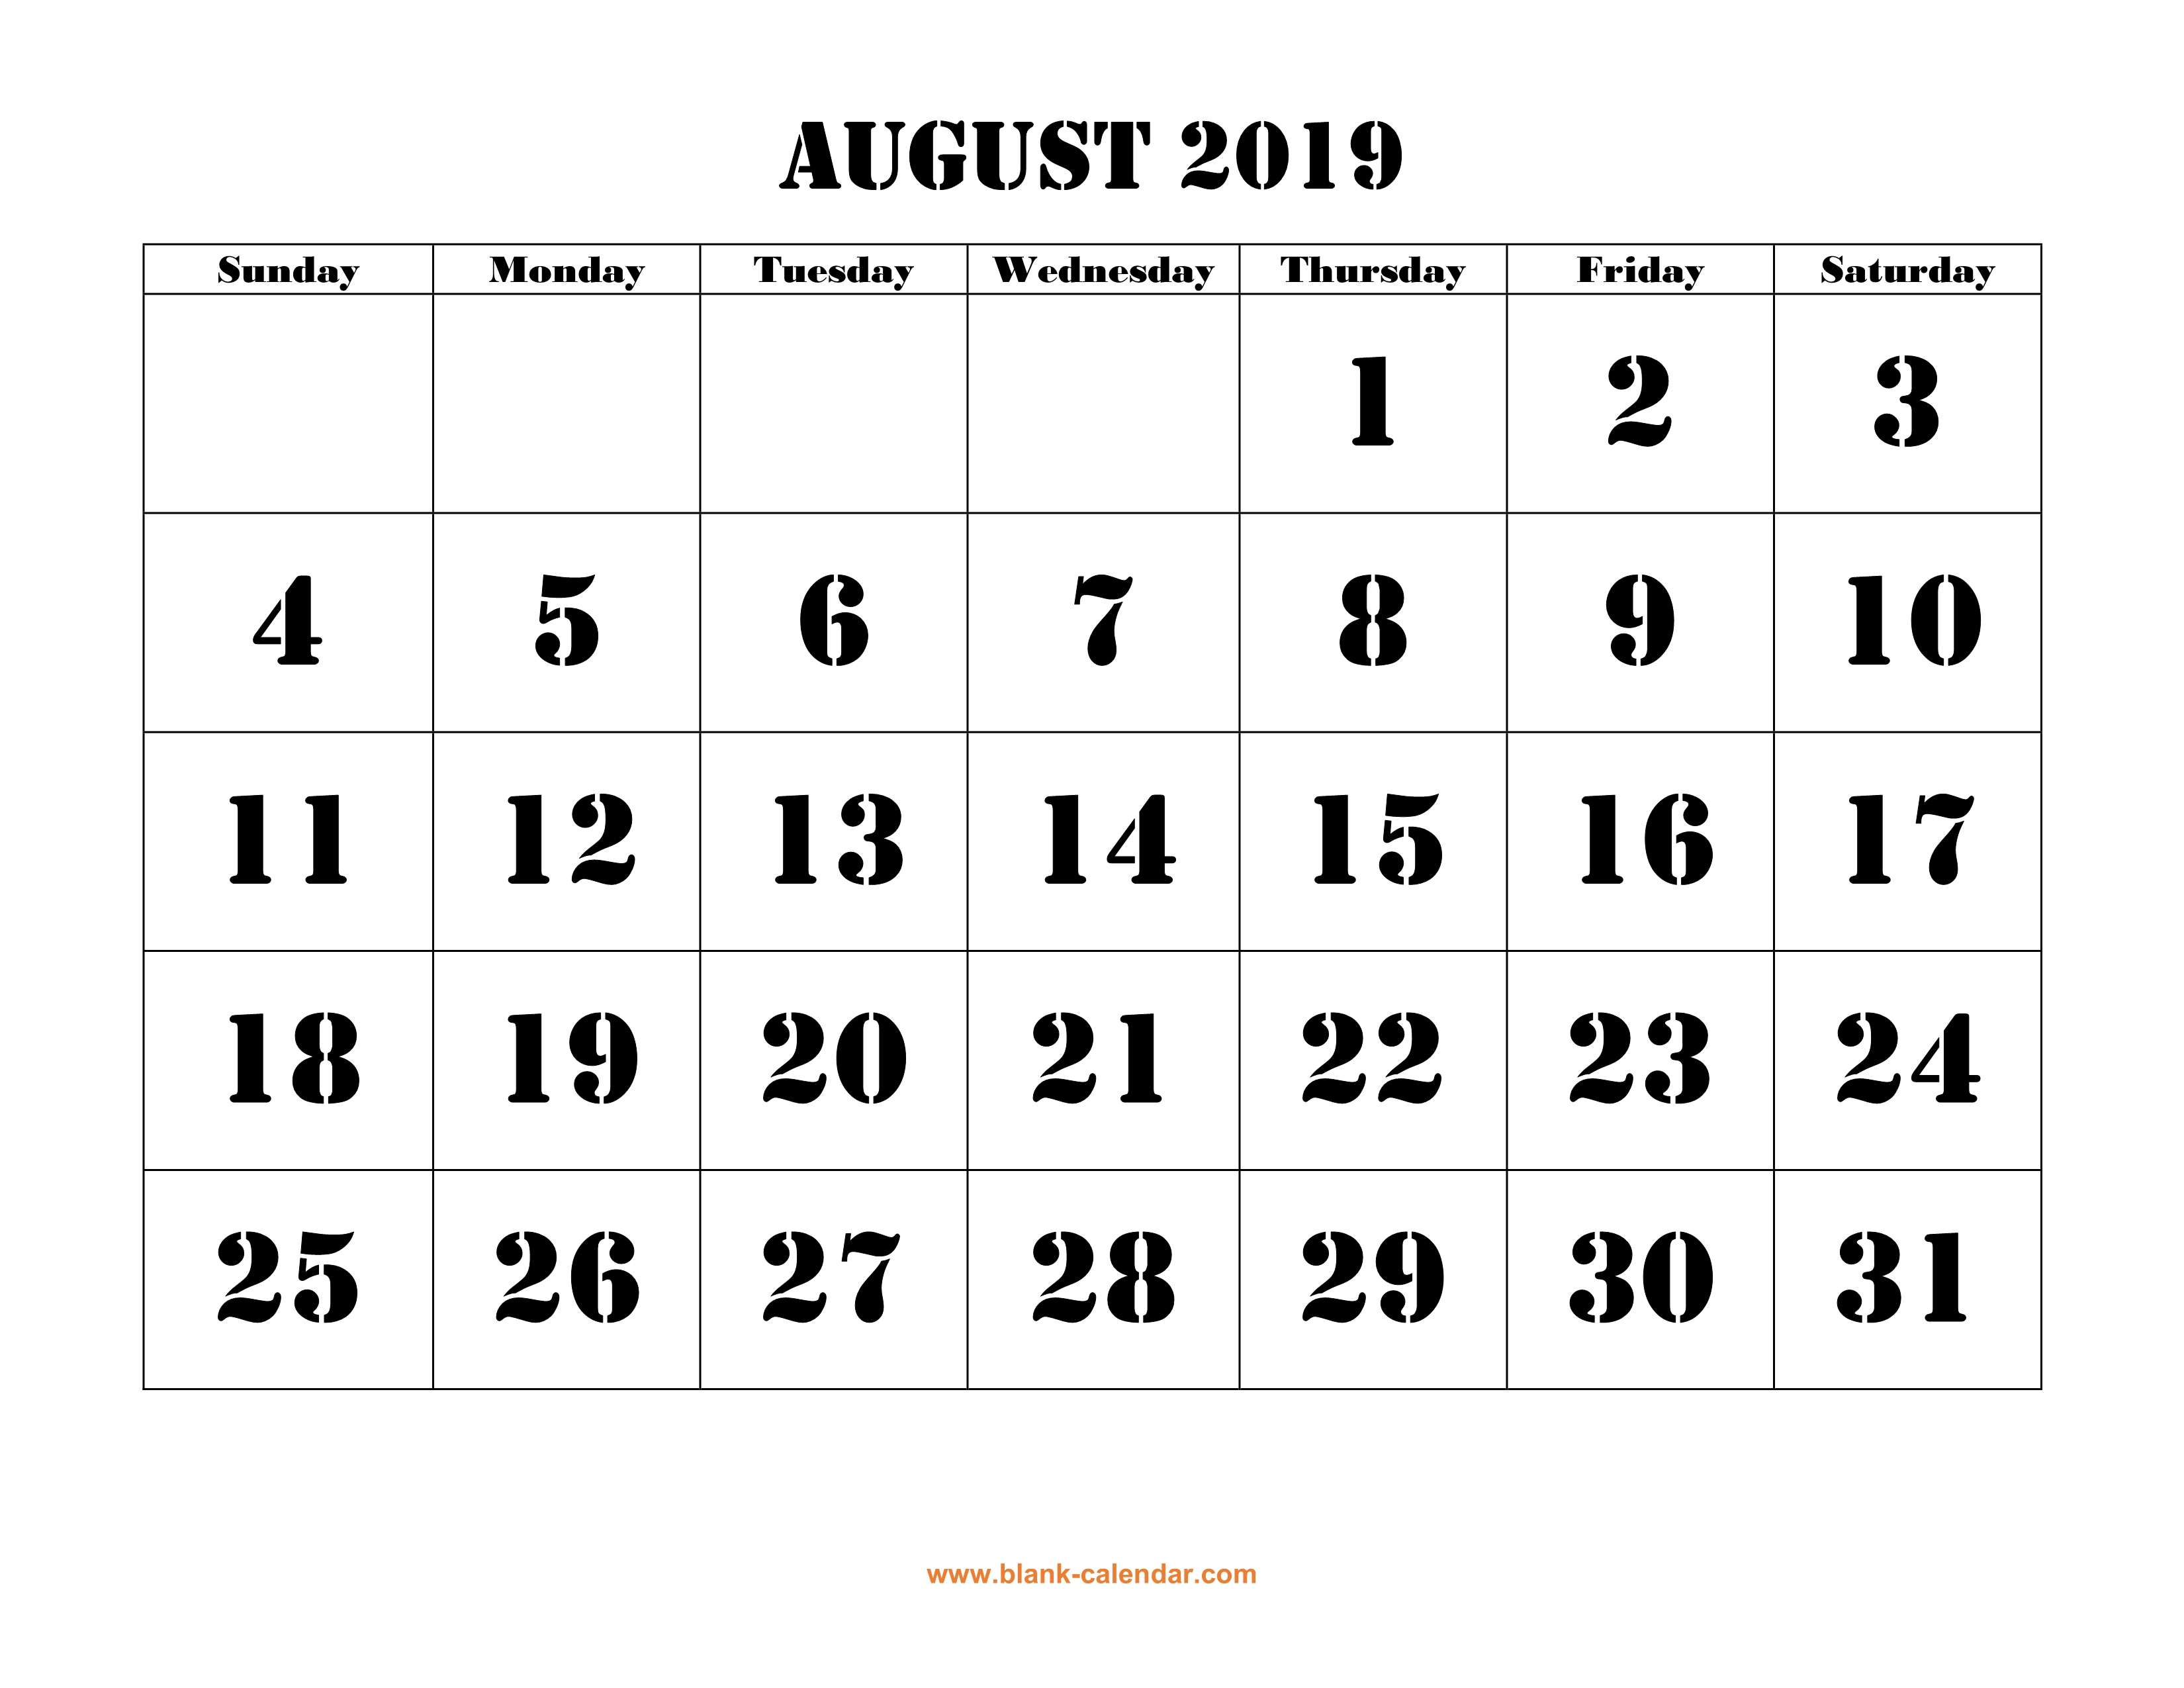 Free Download Printable August 2019 Calendar, Large Font